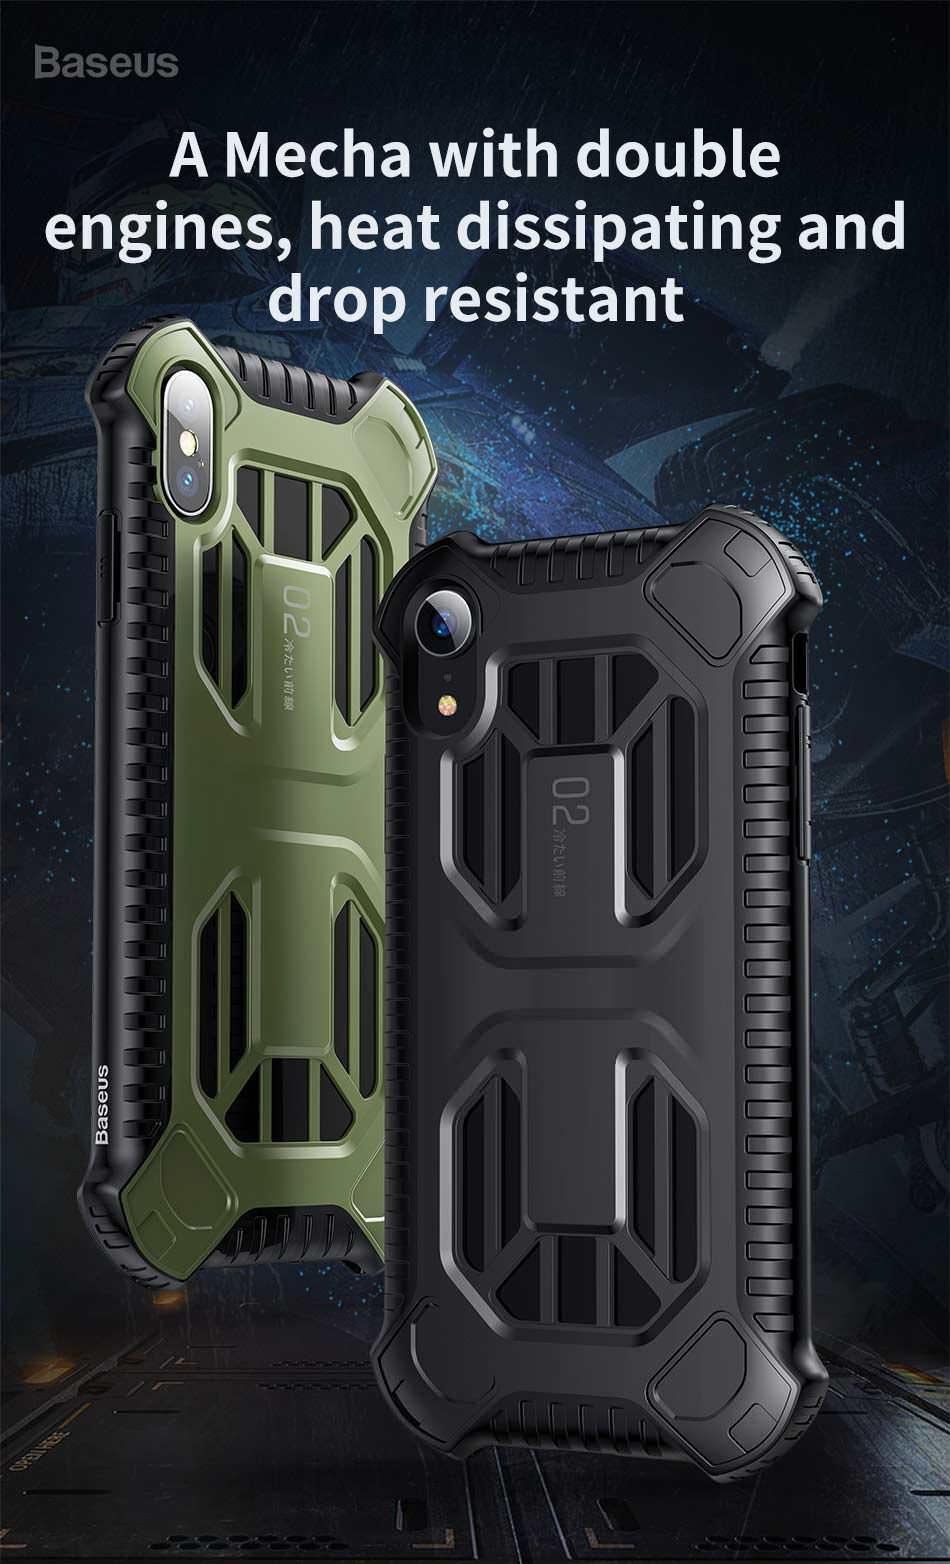 buy baseus iphone case